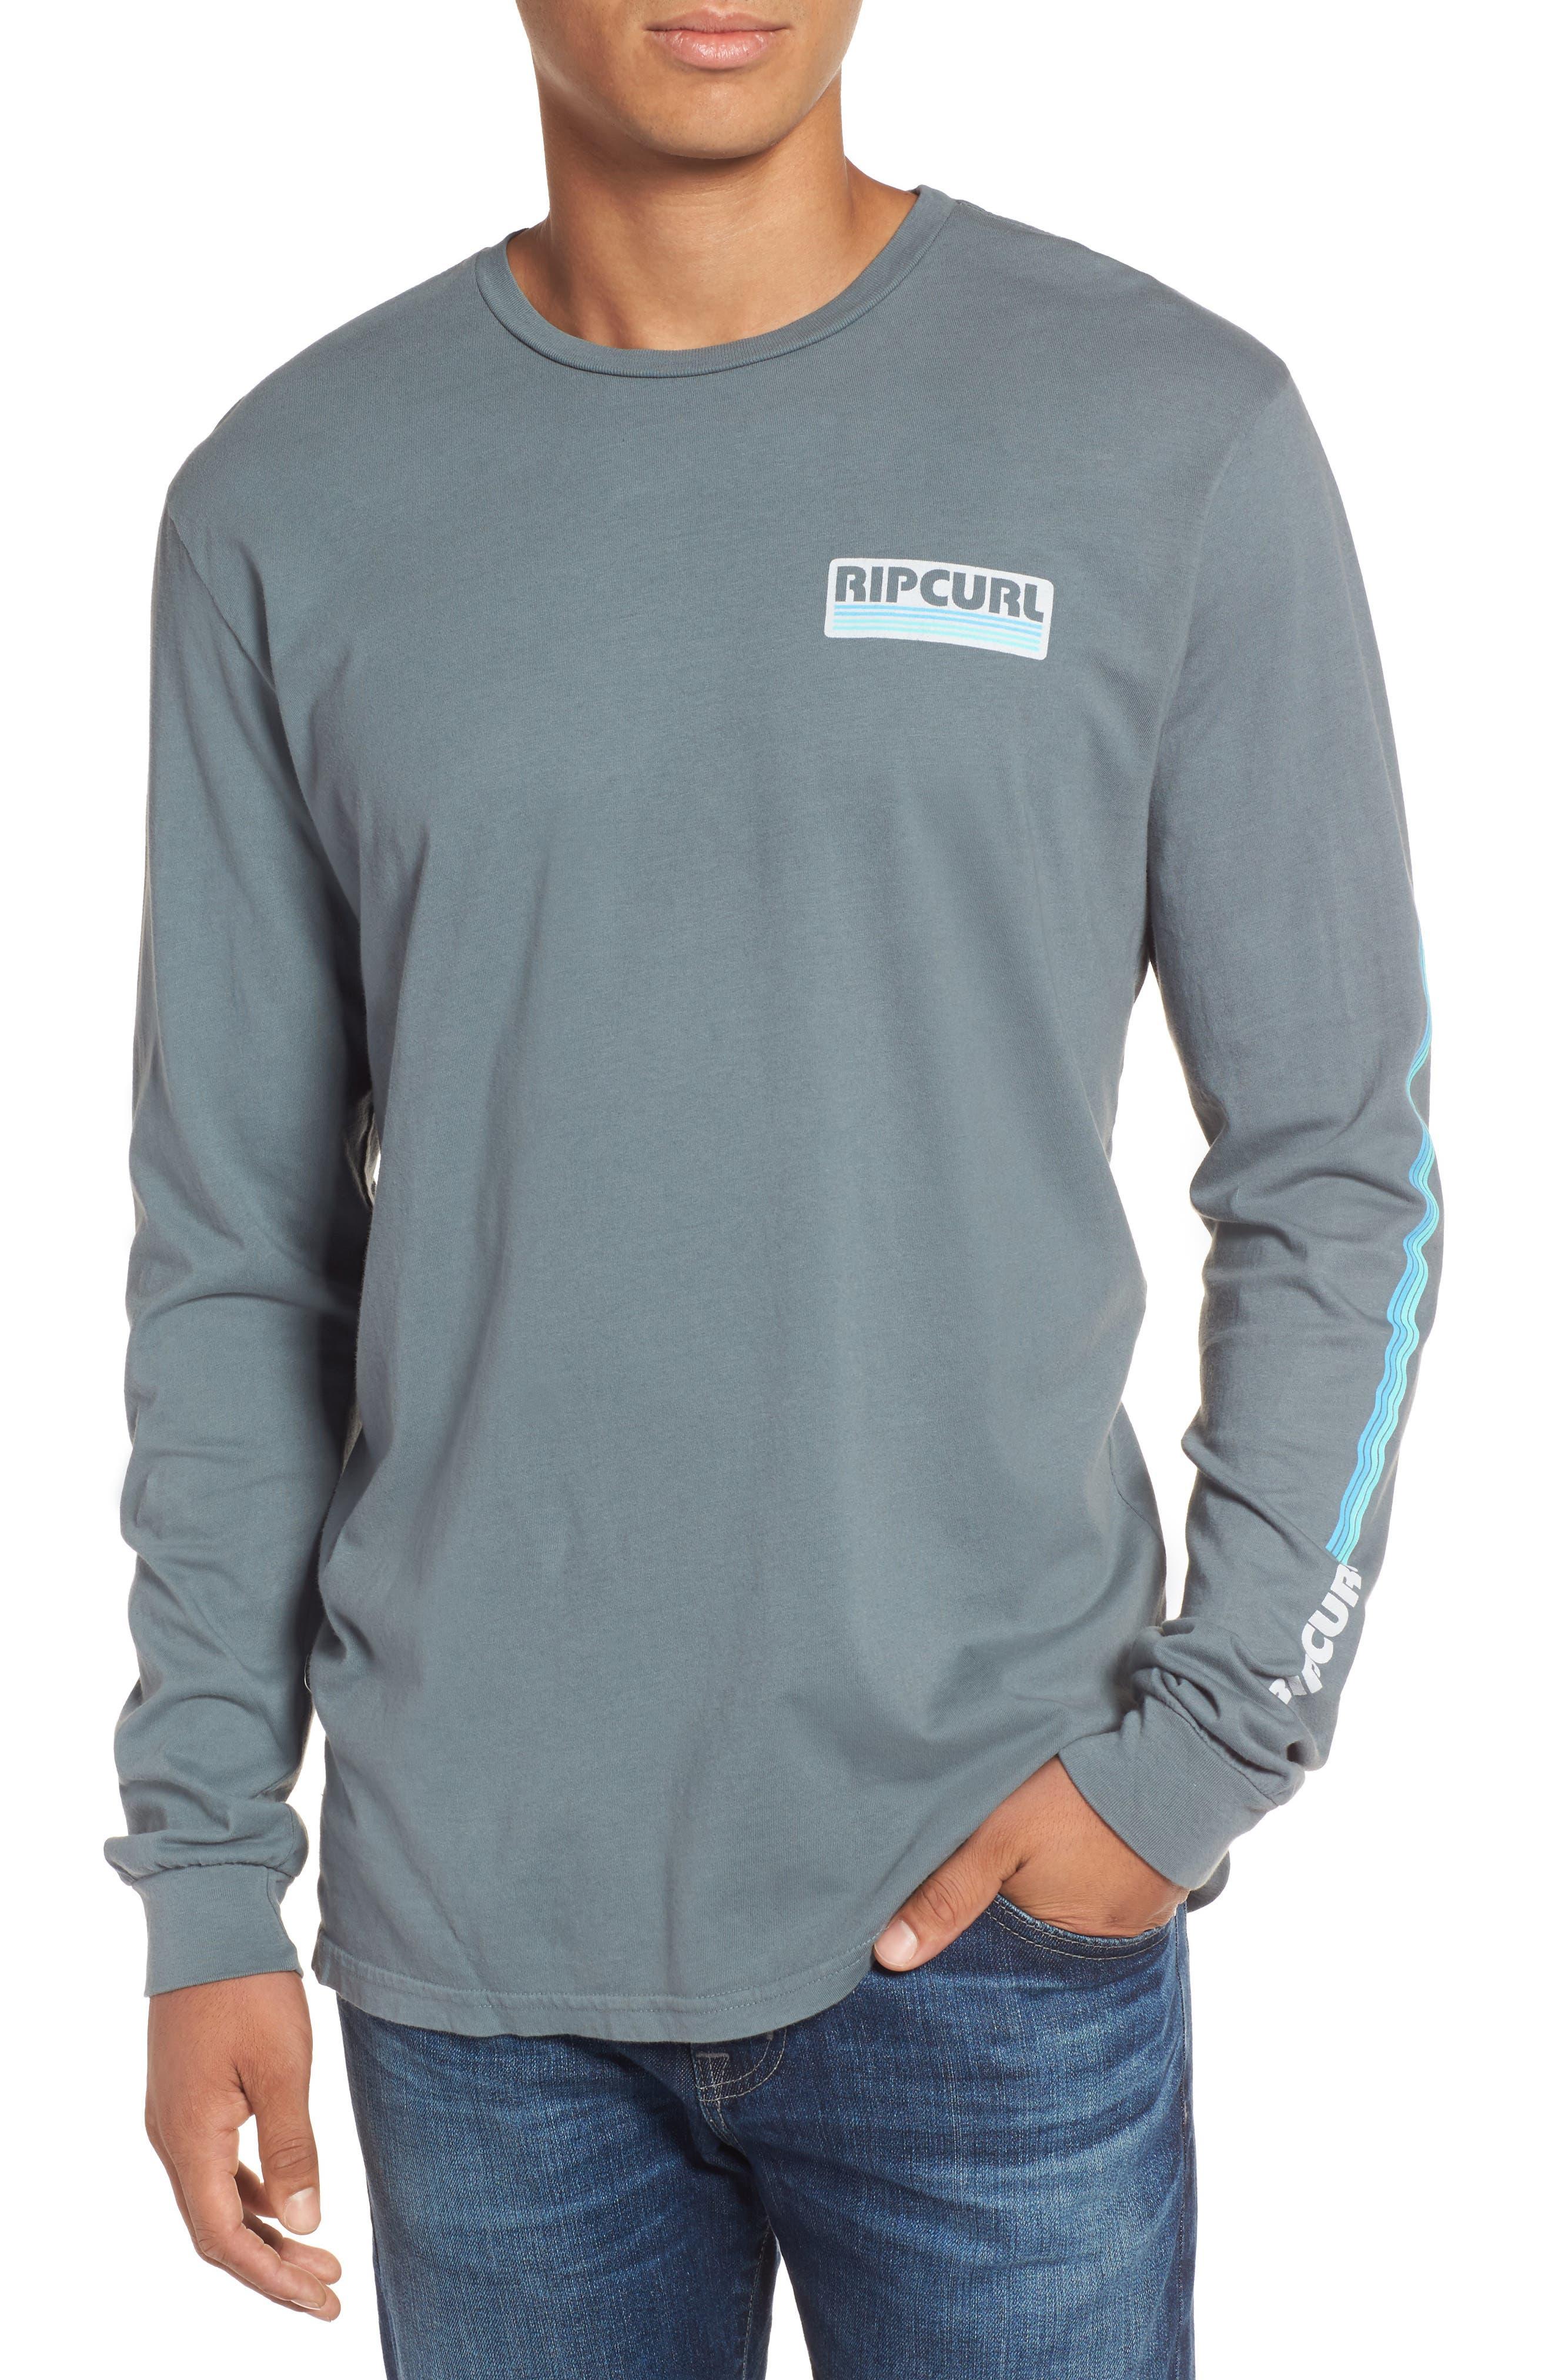 Rip Curl The Pump Long Sleeve Logo Graphic T-Shirt